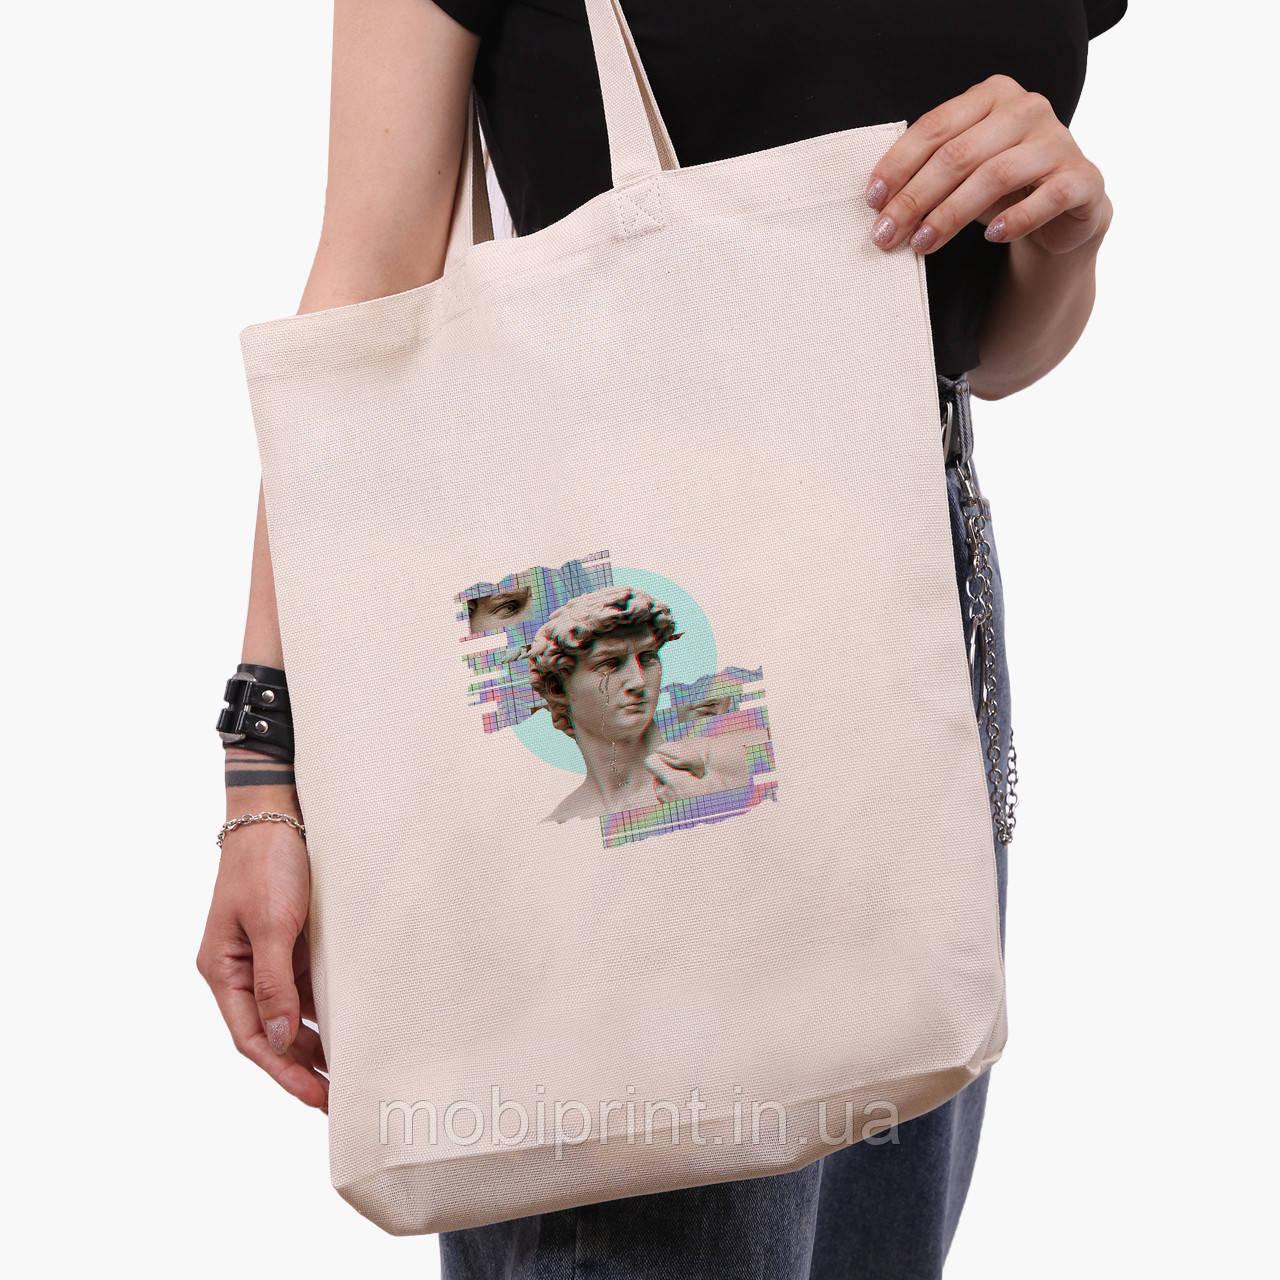 Эко сумка шоппер белая Ренессанс-Давид (David Renaissance) (9227-1584-1)  экосумка шопер 41*39*8 см